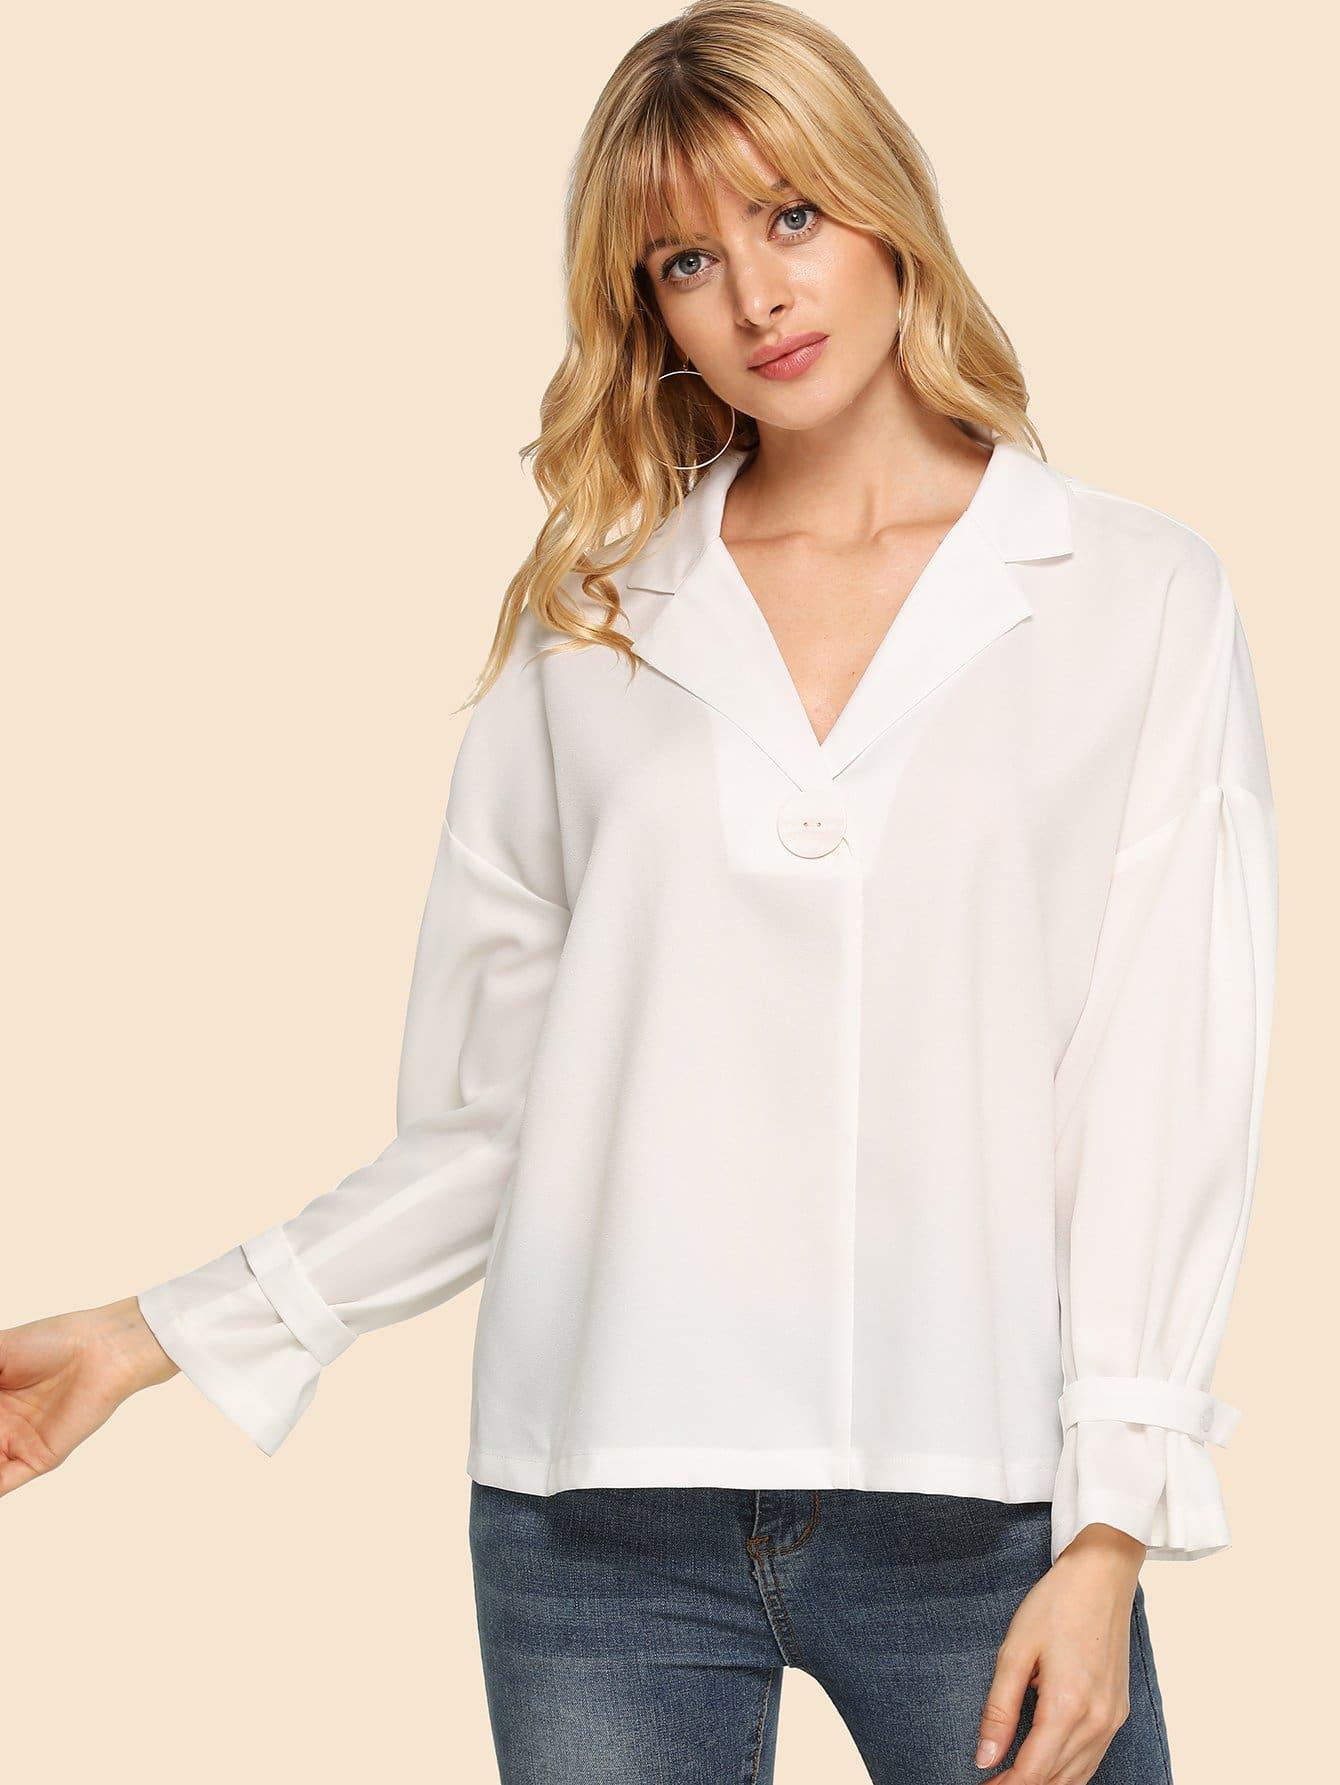 Купить 80 'S блузка с оборками рукавами, Masha, SheIn